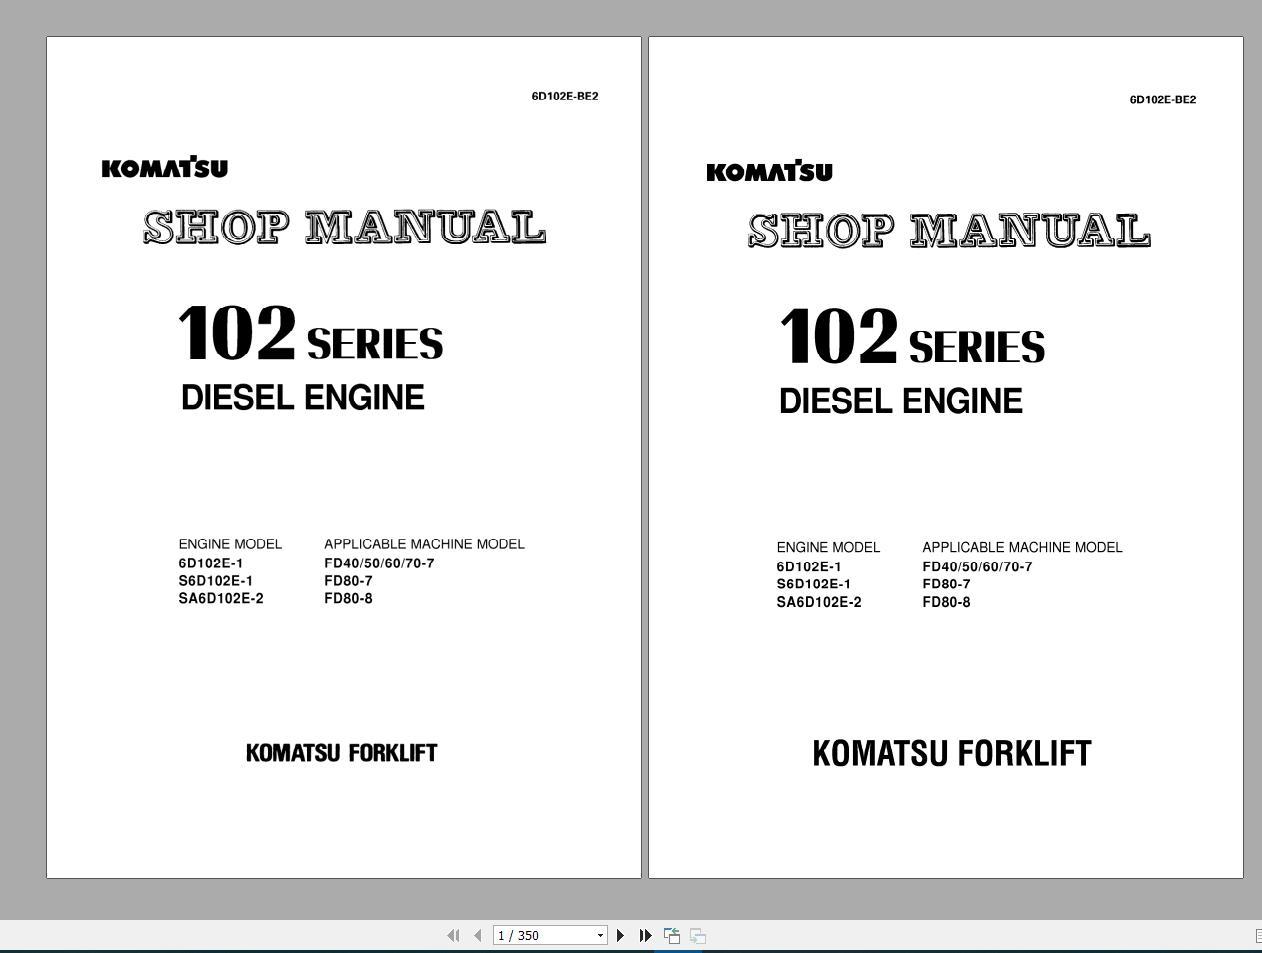 Komatsu_Forklift_Service_Manual_PDF_DVD3